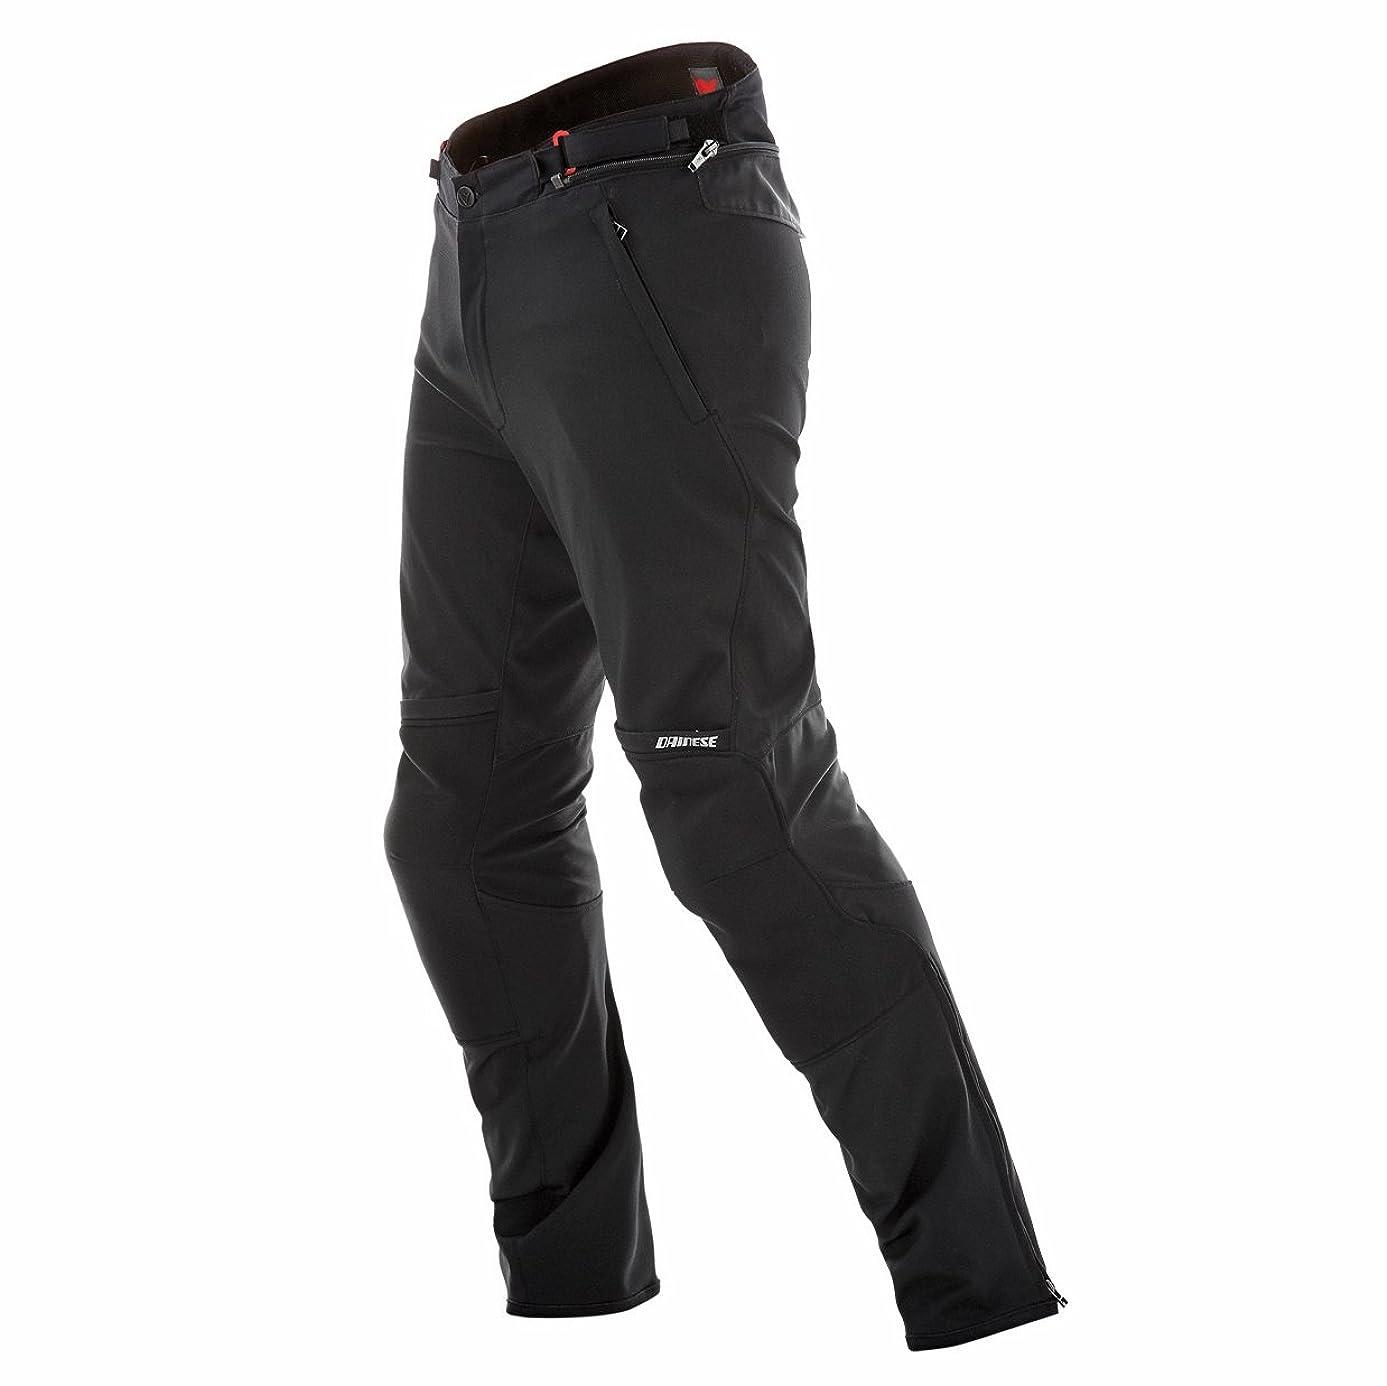 Dainese New Drake Air Textile Pants Black Size 60 Euro/50 US